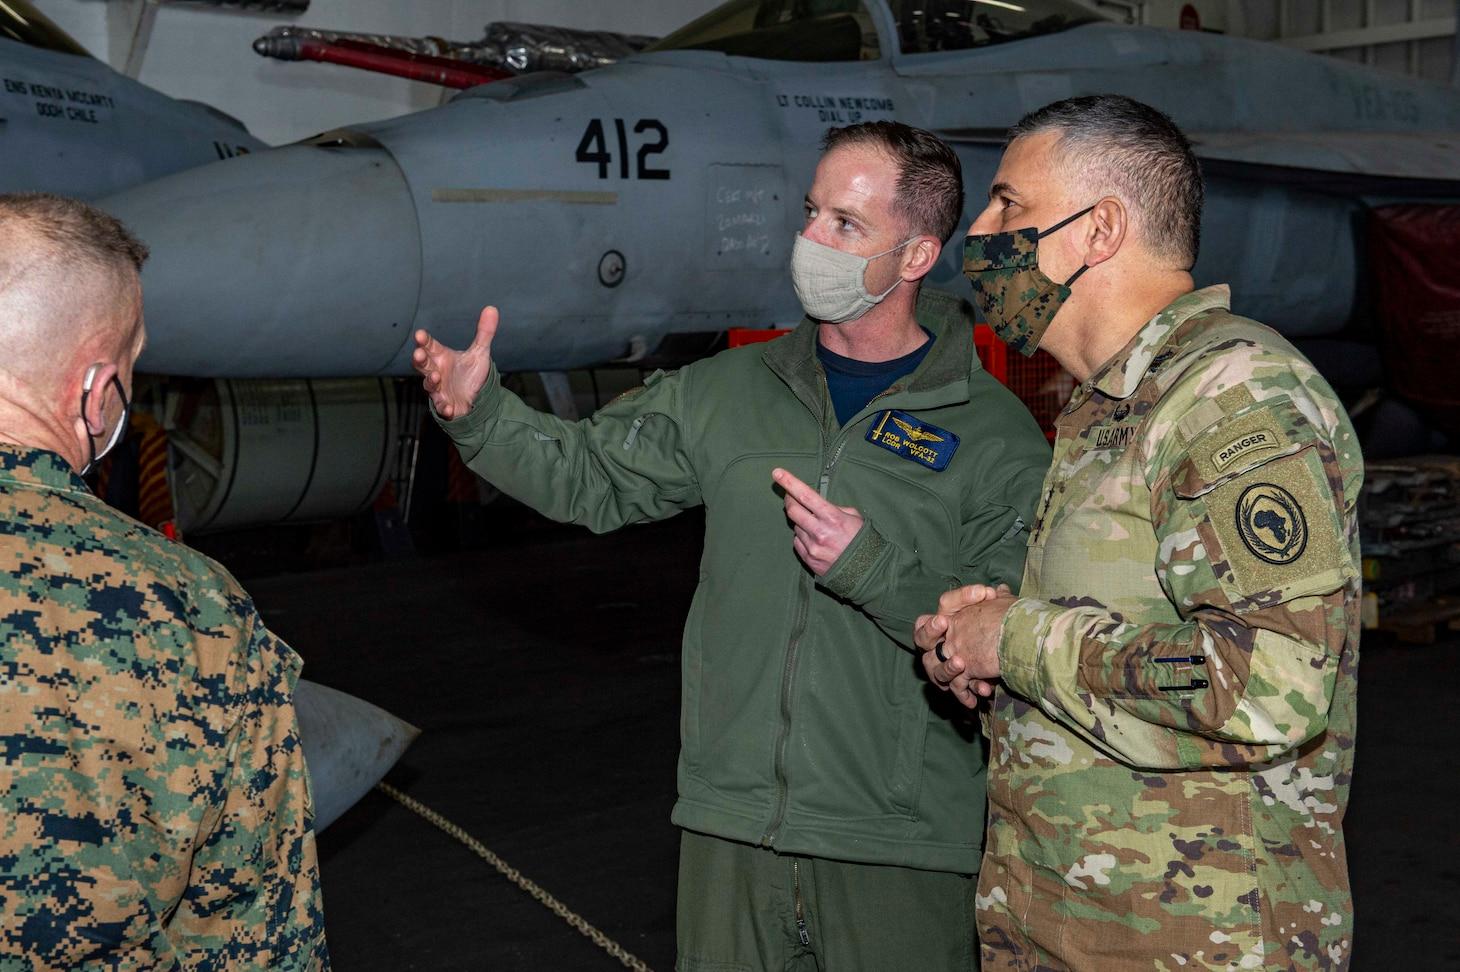 Gen. Stephen Townsend, Commander, United States Africa Command, observes flight operations aboard the Nimitz-class aircraft carrier USS Dwight D. Eisenhower (CVN 69), in the Mediterranean Sea, March 25, 2021.